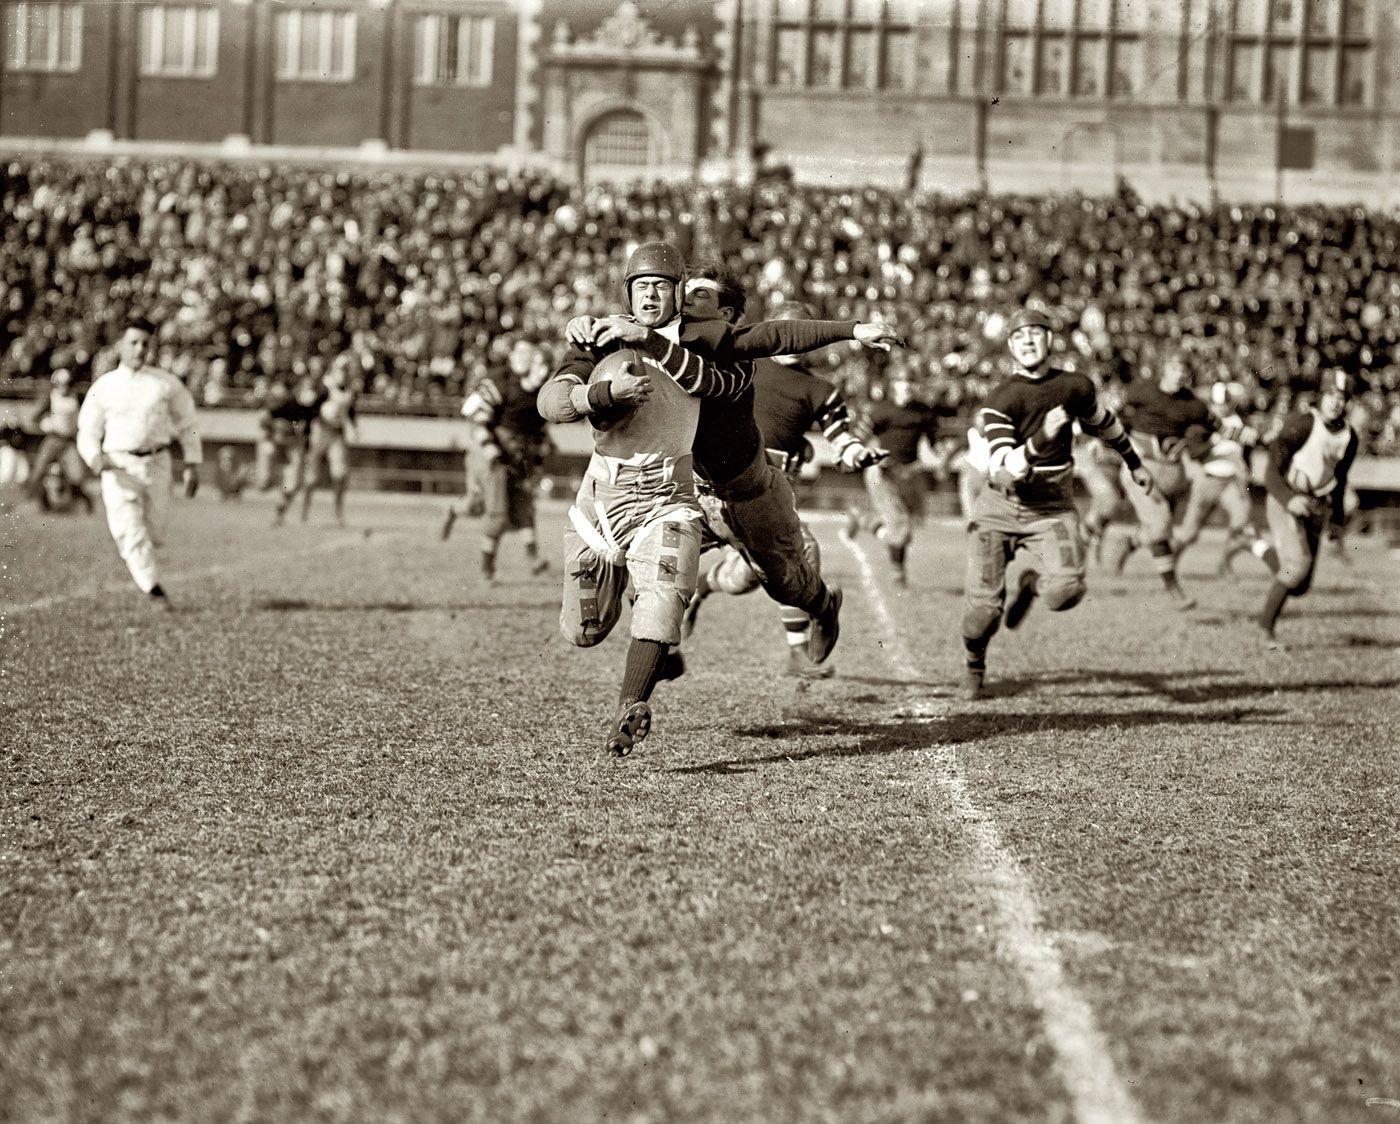 November 3, 1923. High school football in Washington, D.C